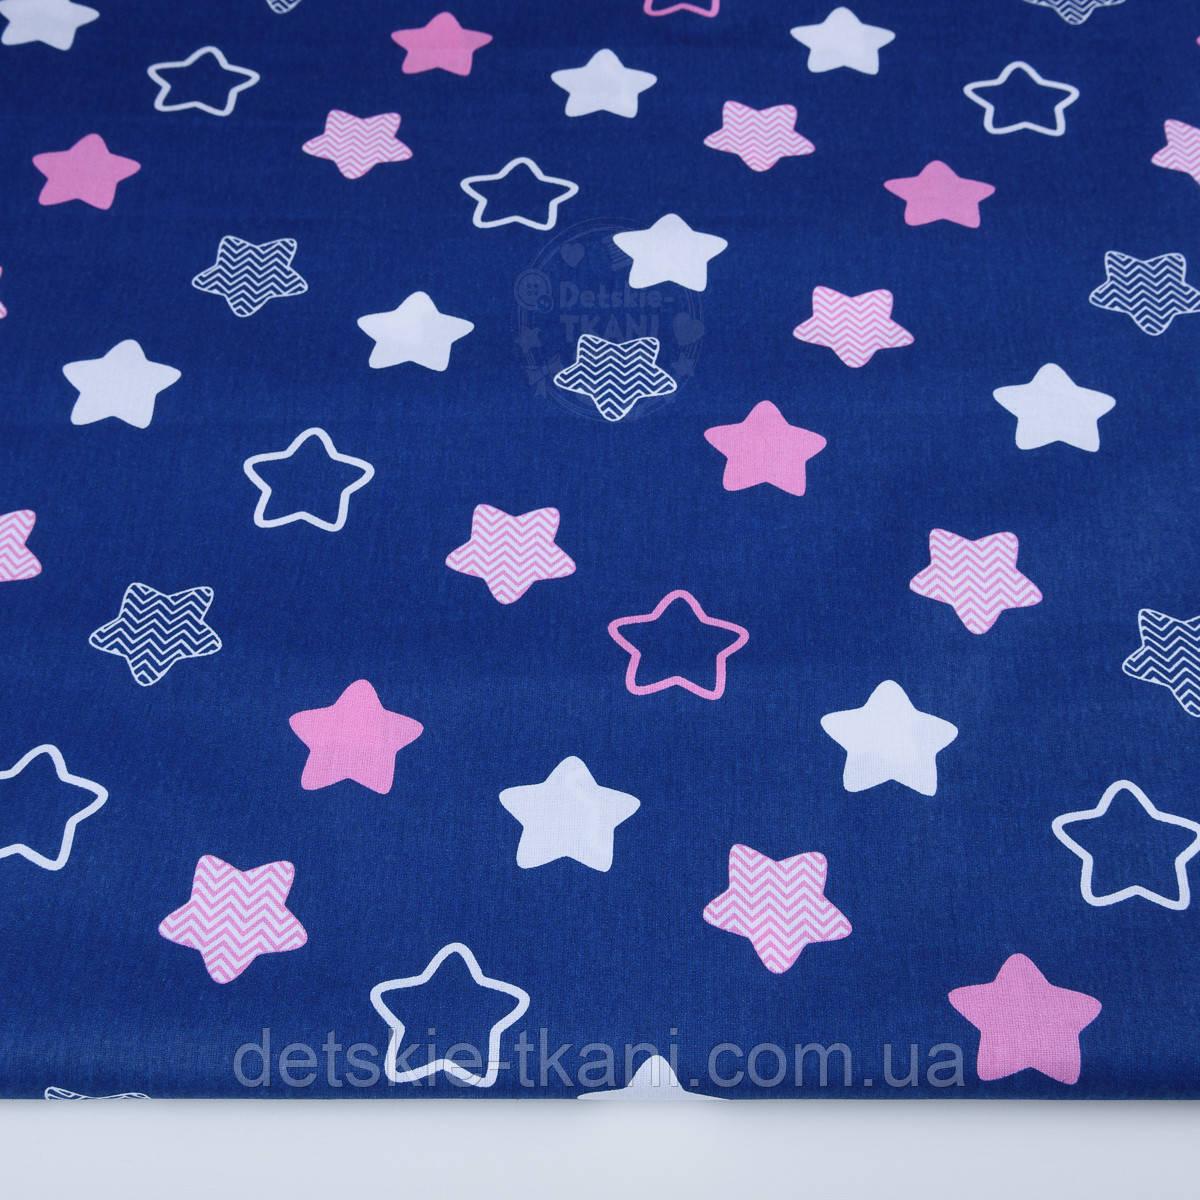 "Отрез ткани ""Звёзды-пряники с зигзагами"" розовые на синем, №1288, размер 70*160"